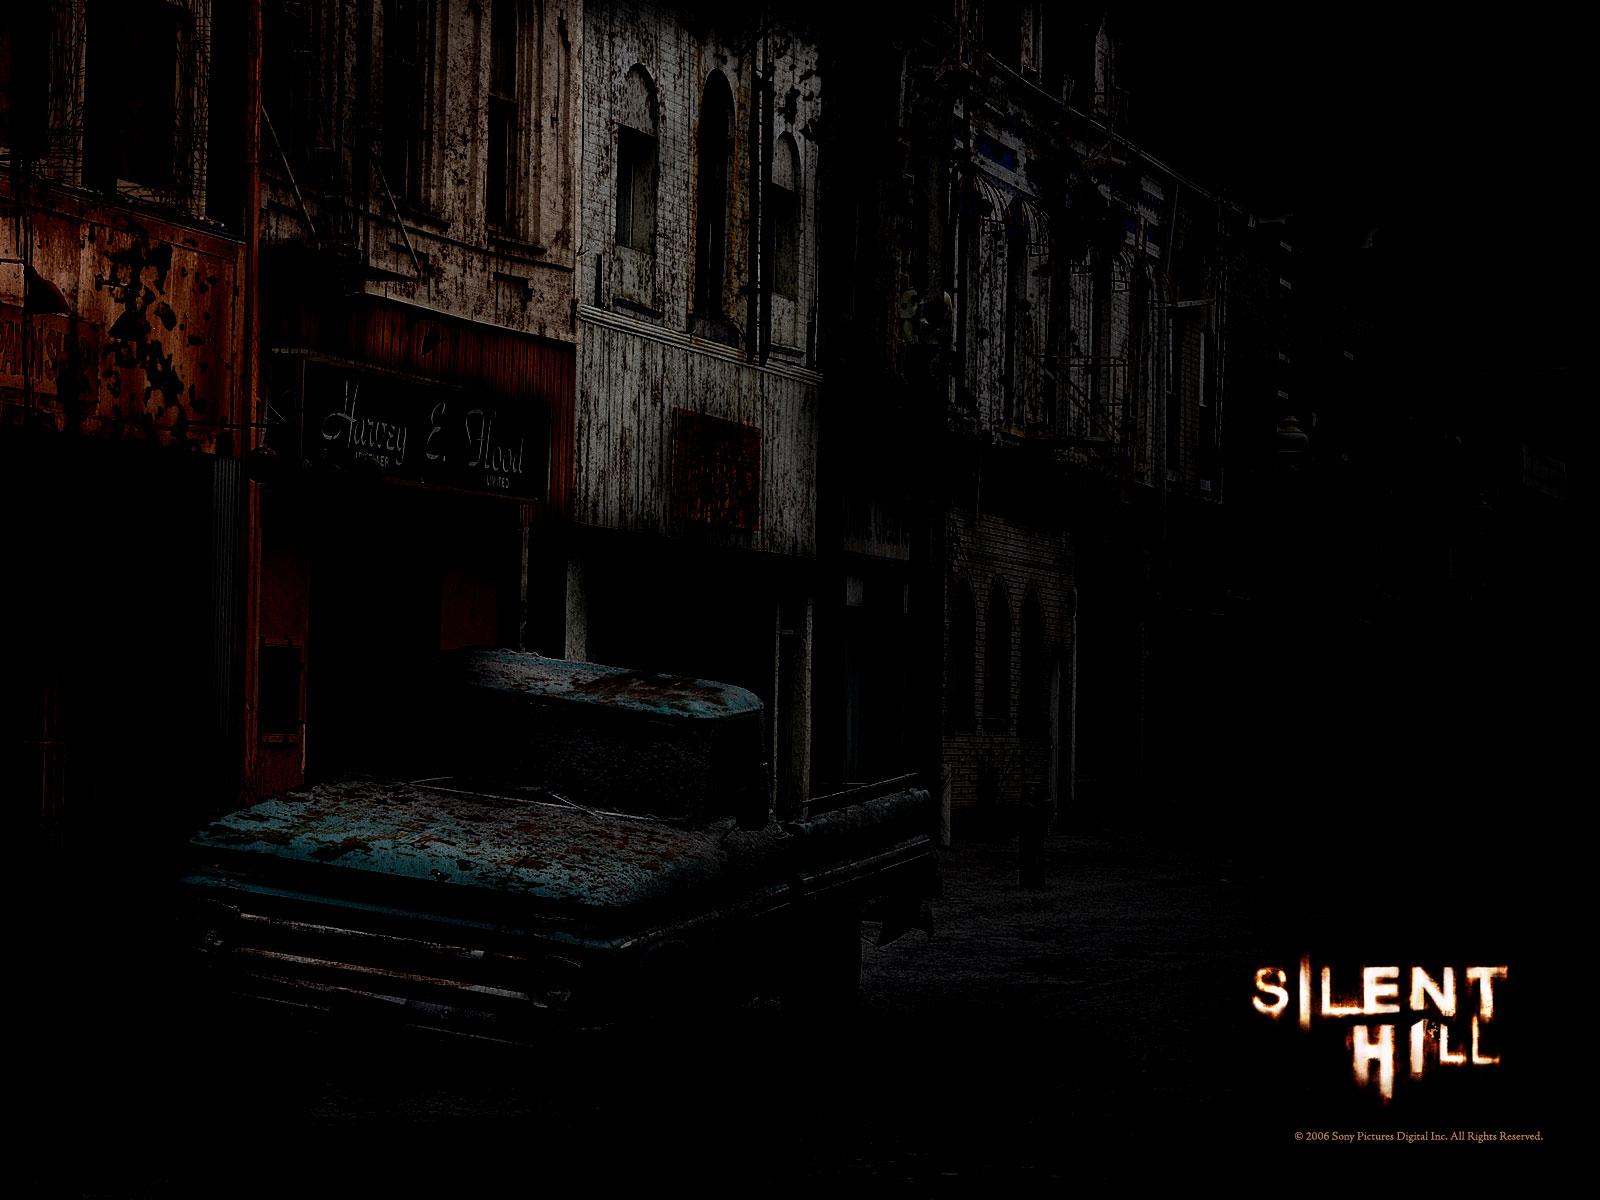 http://1.bp.blogspot.com/-i8DtG_CdxnM/TcVLoqcY3eI/AAAAAAAAACo/OO3PsveEBbw/s1600/1_silent_hill_wallpaper_1_1600.jpg